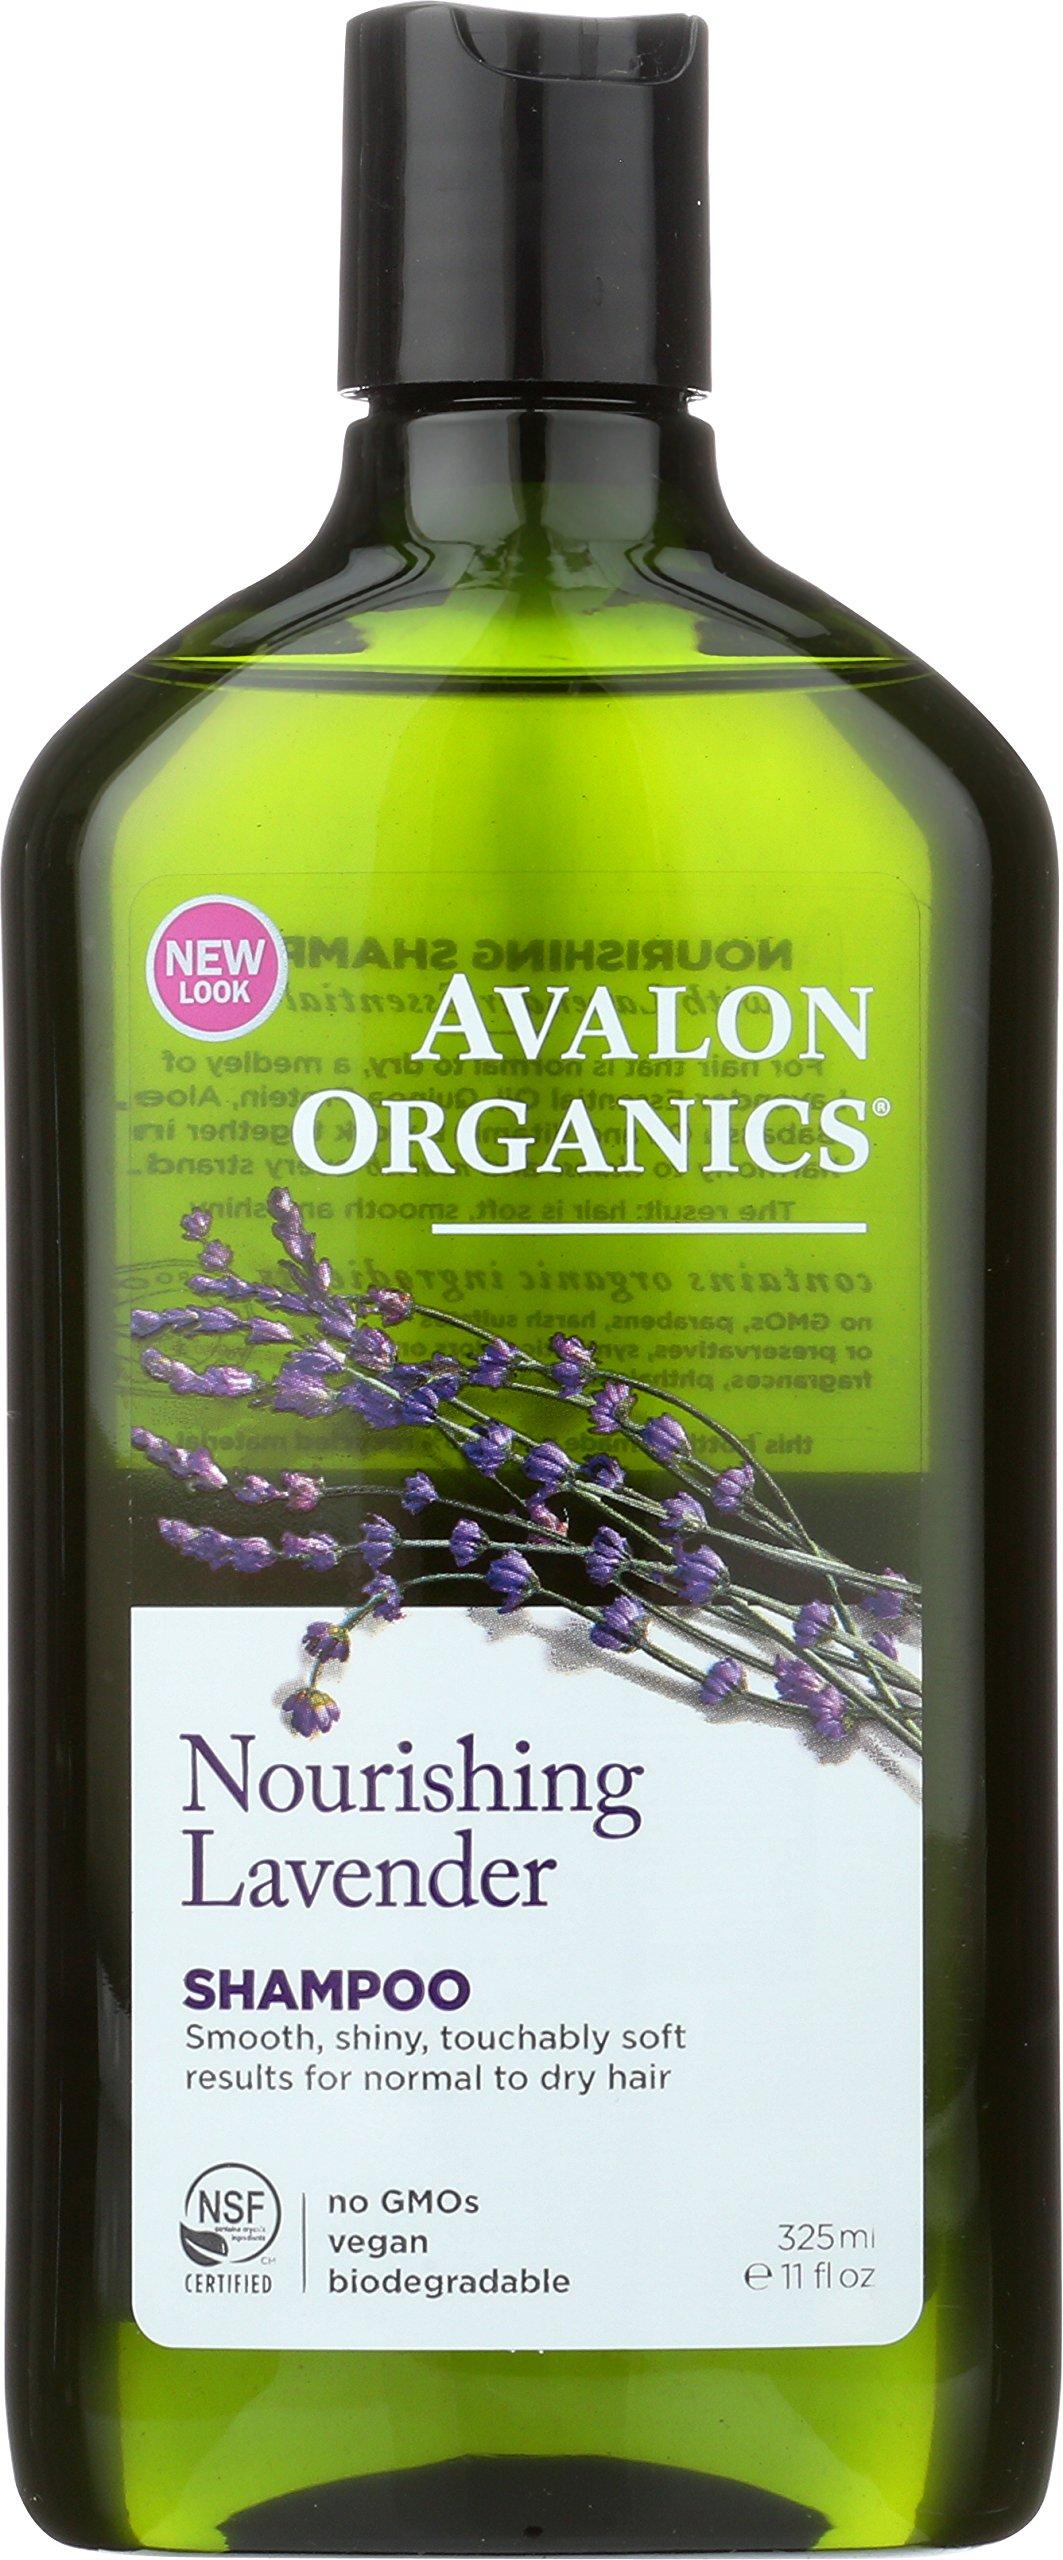 Avalon Organics Nourishing Lavender Shampoo, 11 oz.